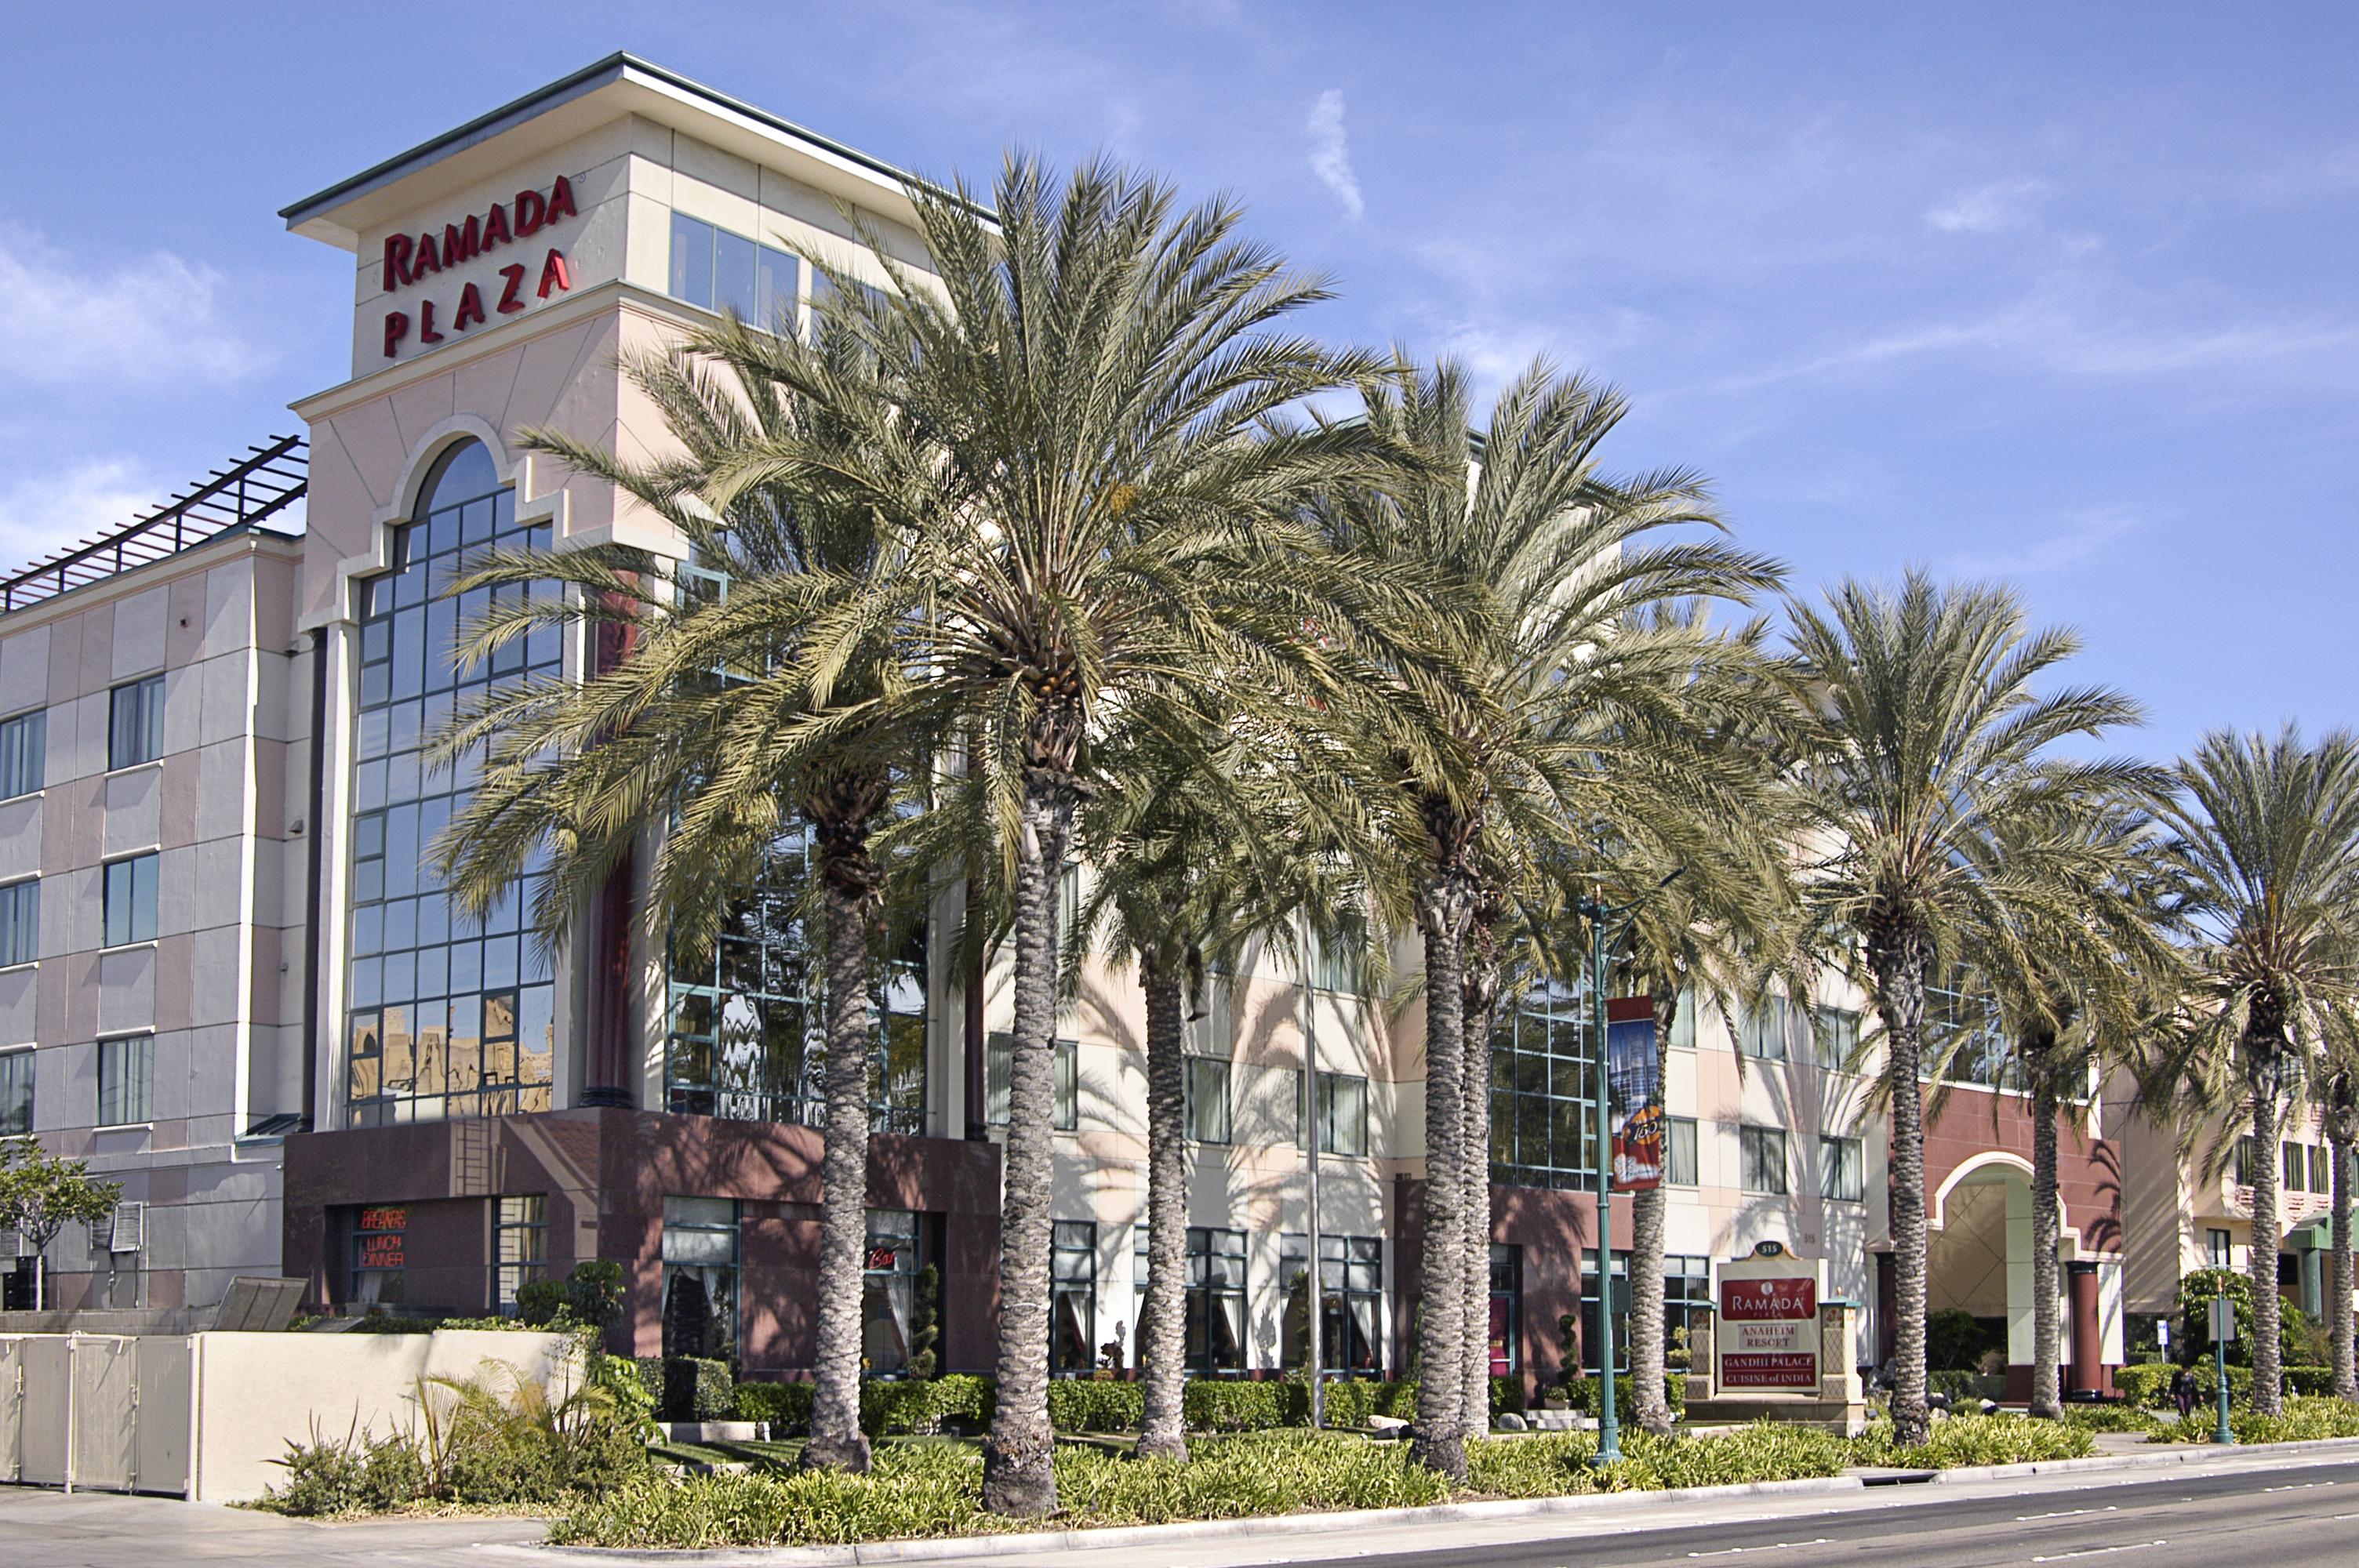 Ramada Plaza Anaheim -- Anaheim, California